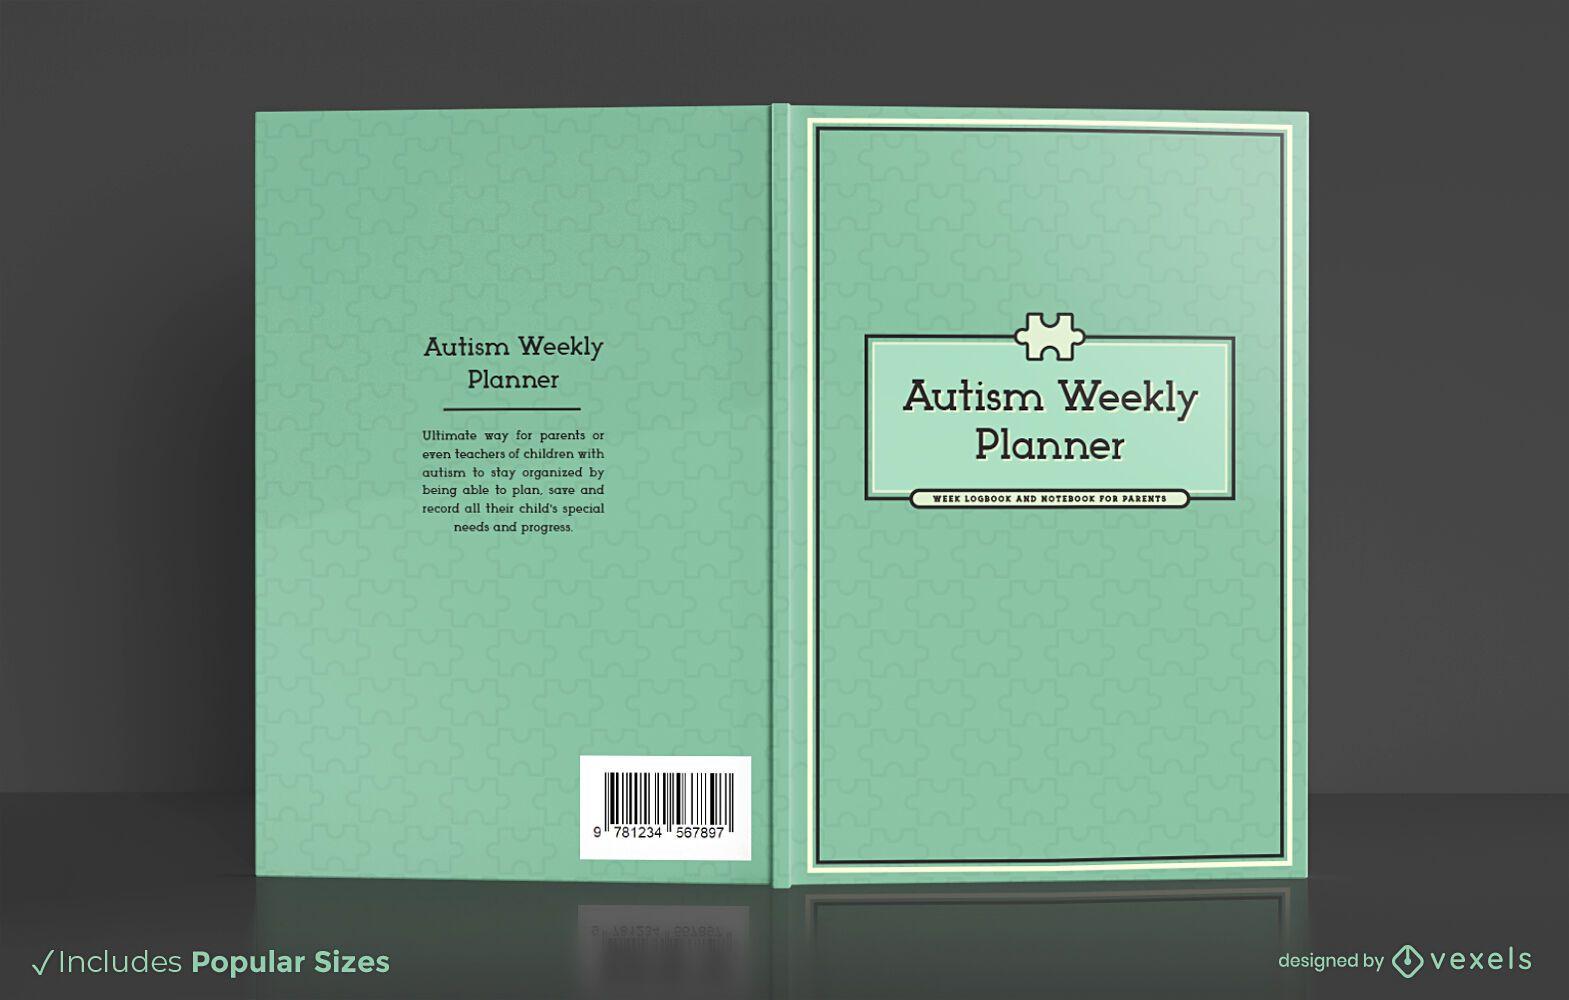 Diseño de portada de libro de planificador semanal de autismo